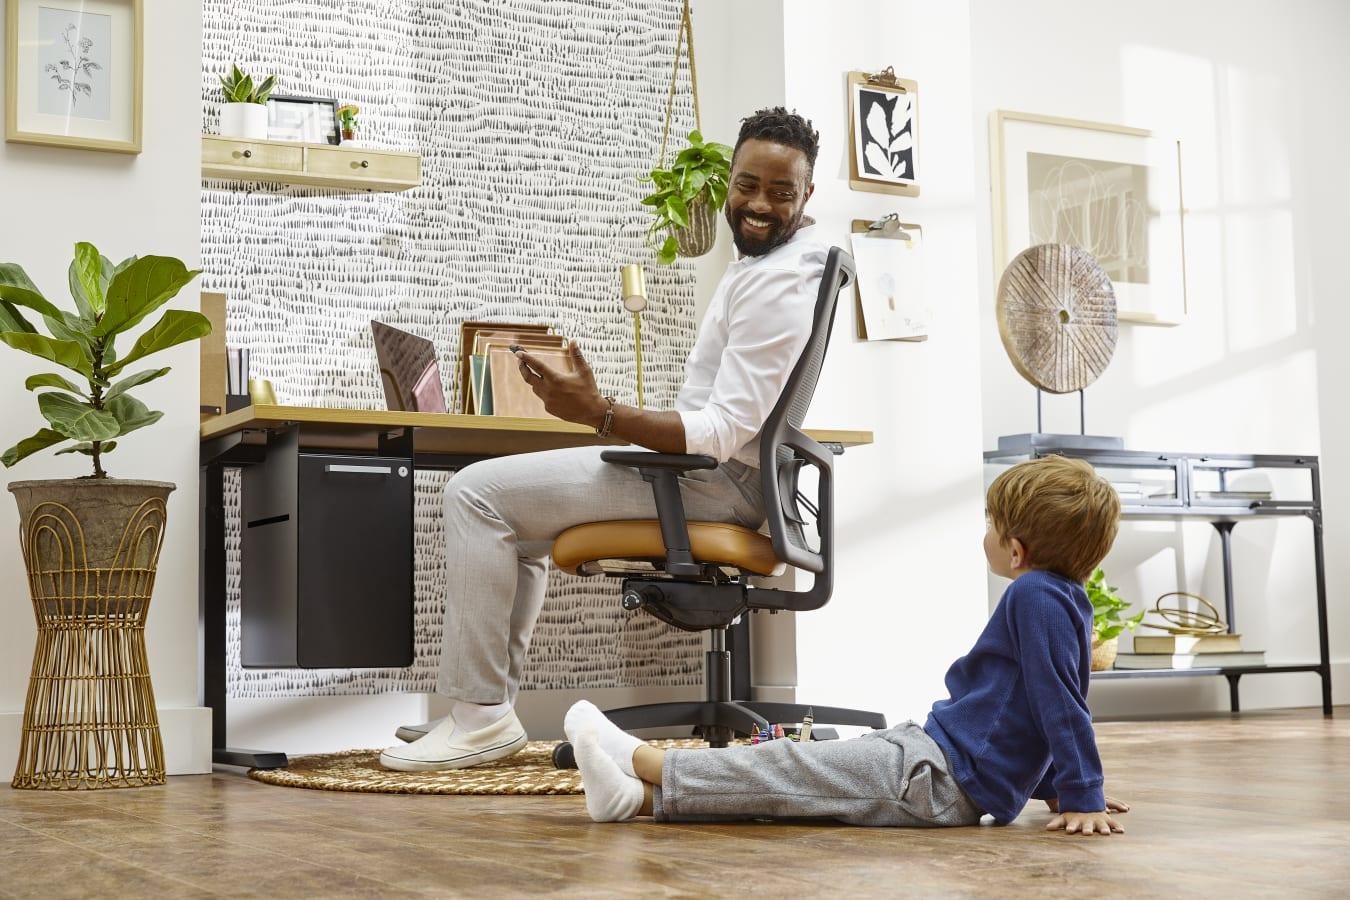 HON/Marketing%20Resources/hon.com/Research-Insights/HON-Blog-Ergonomics-Matter-Home-In-Office-001